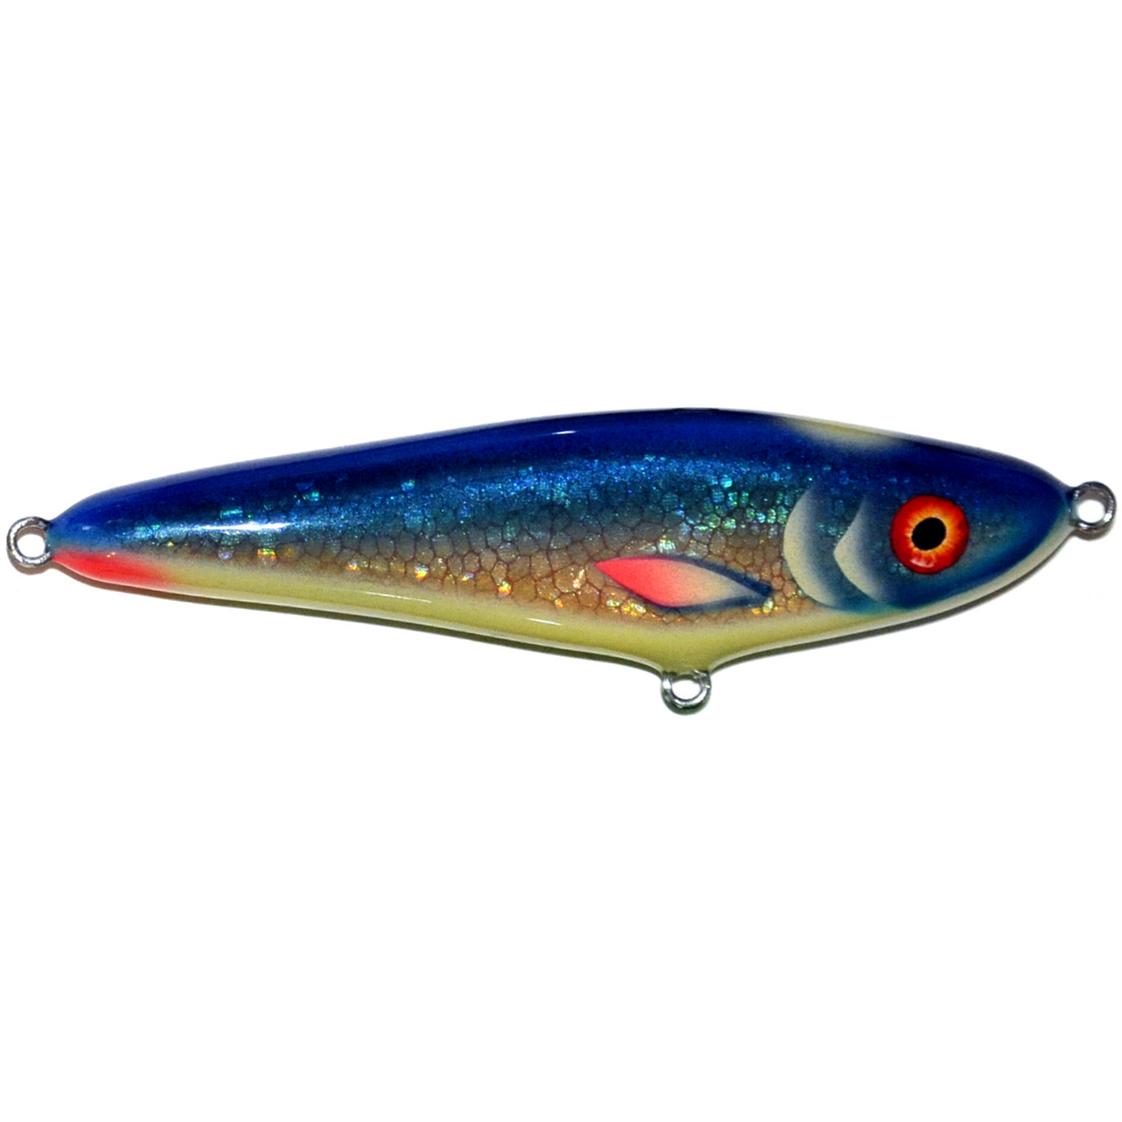 Palych Custom Mower SU Blue Fish